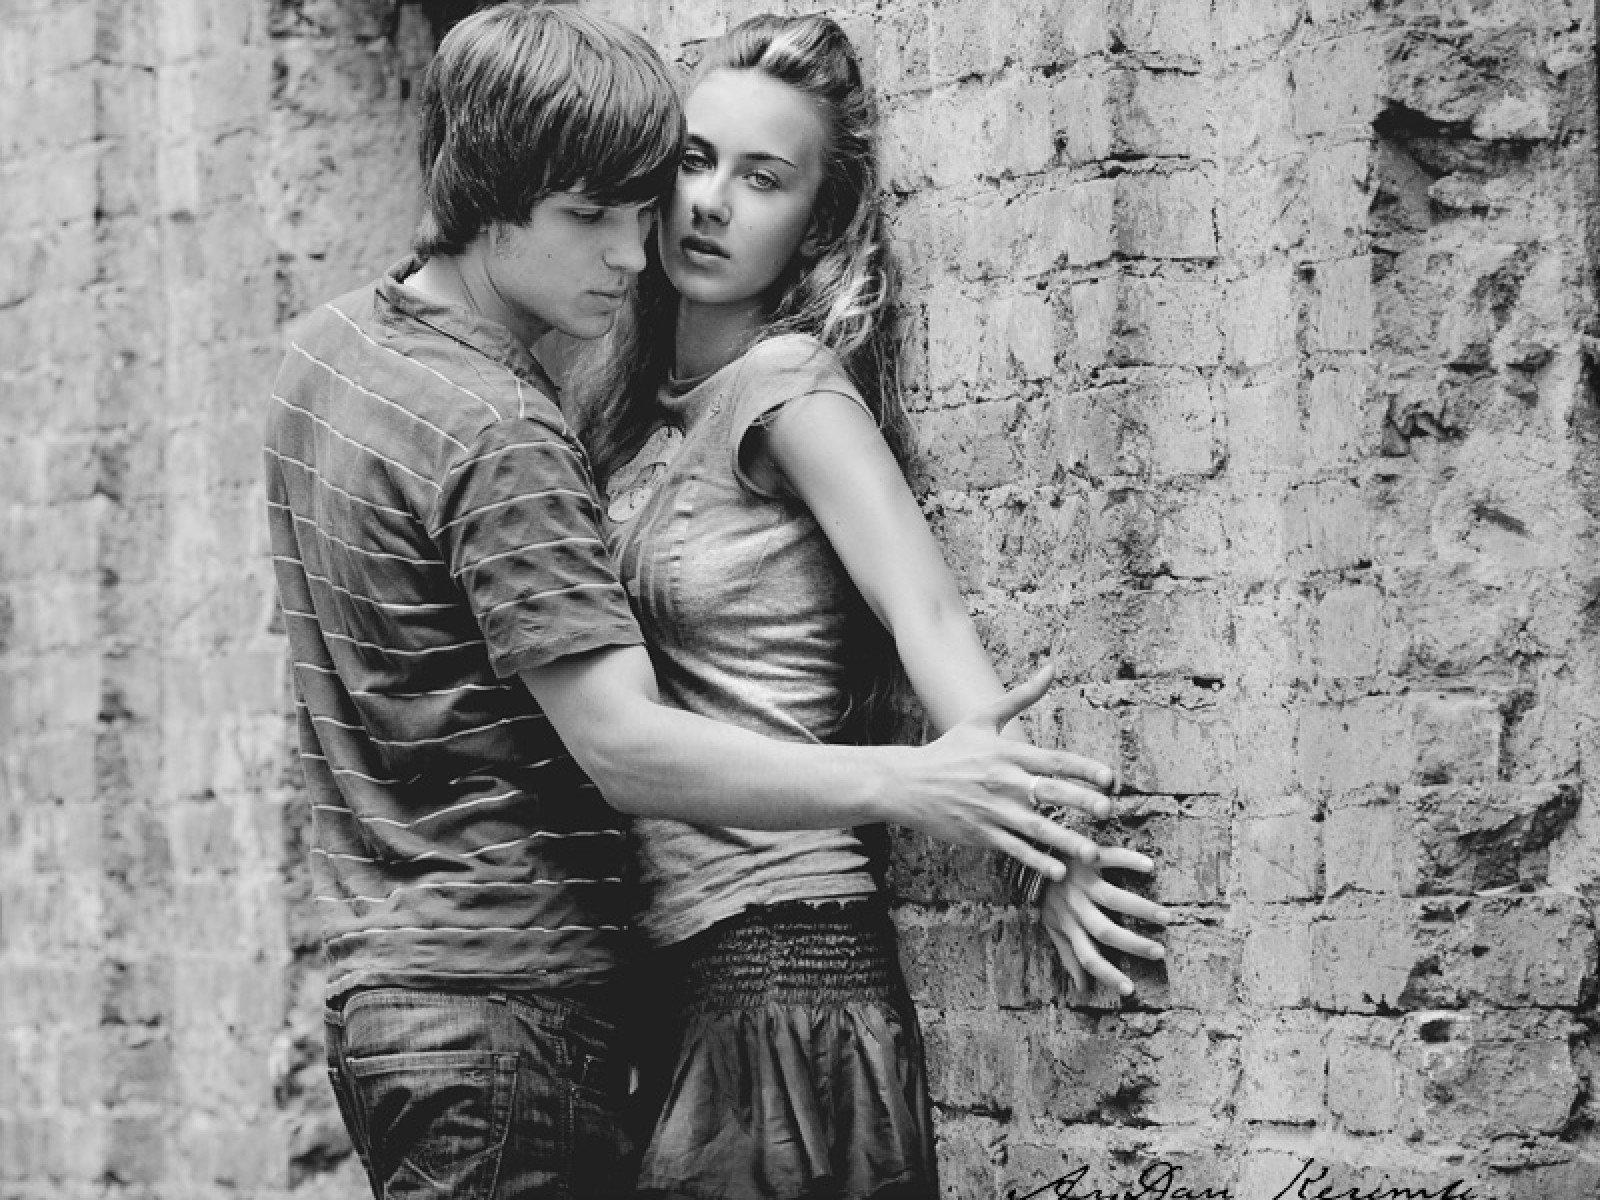 Поцелуи у стены картинки